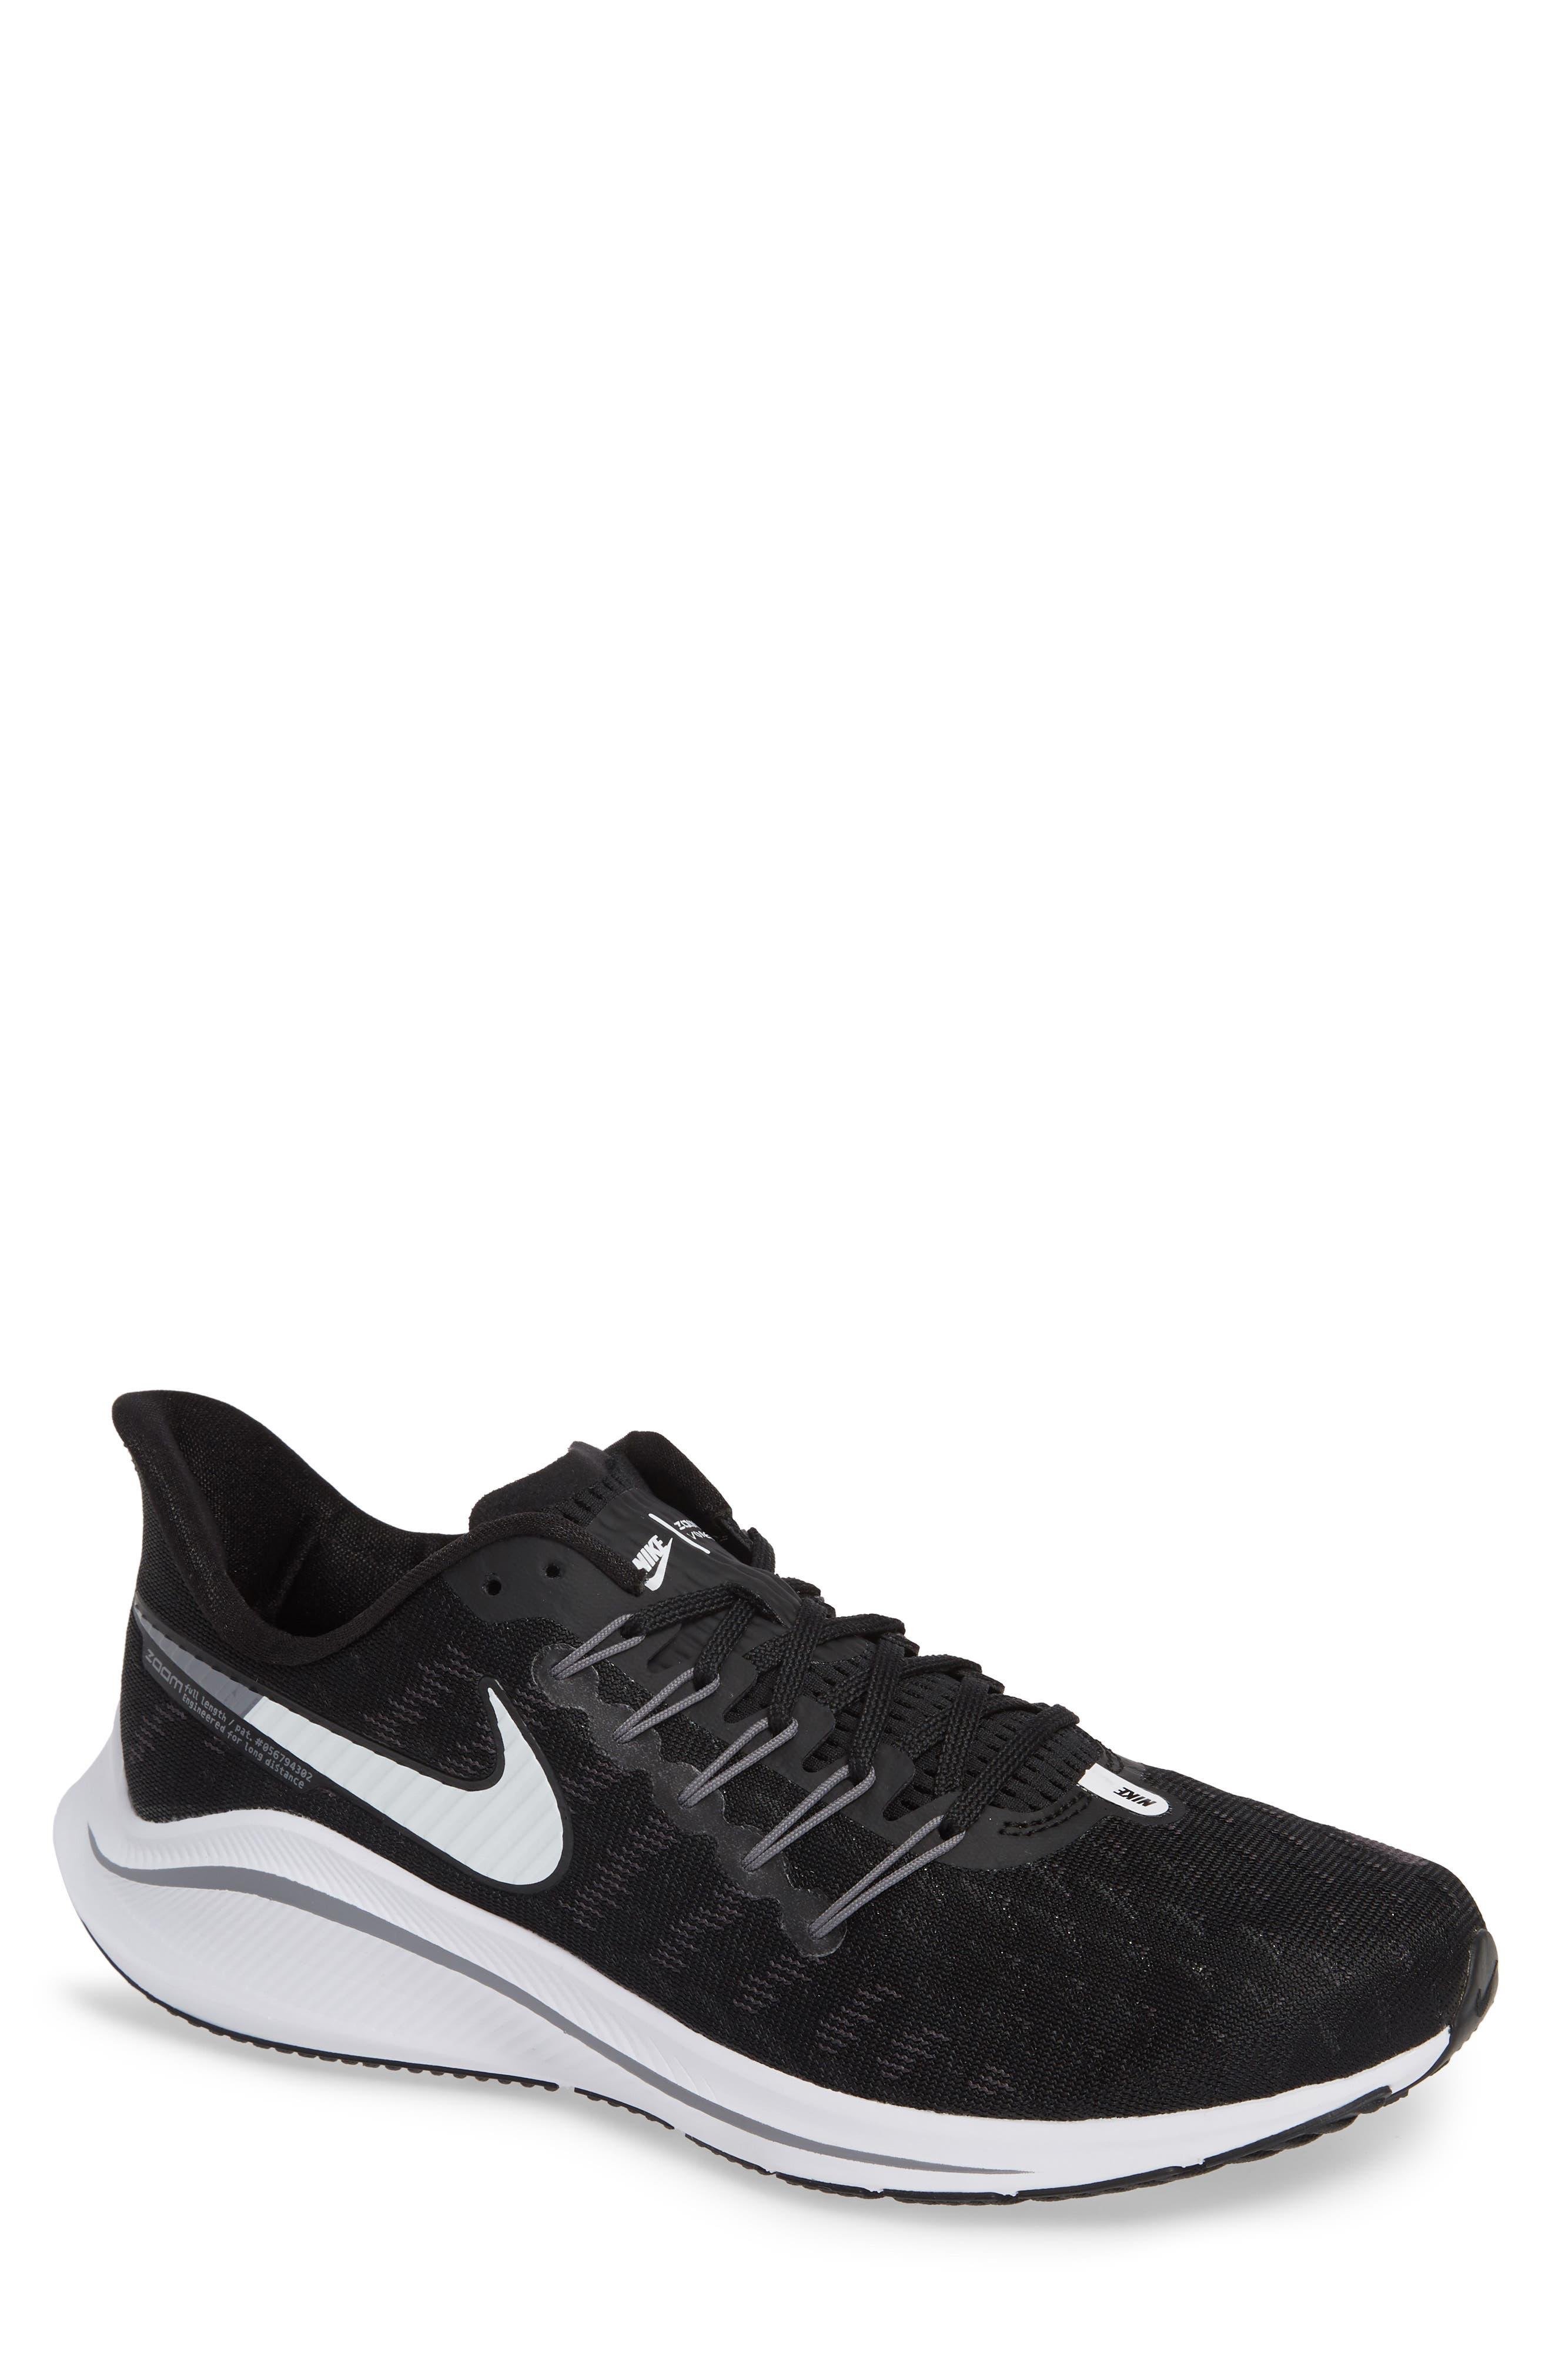 Air Zoom Vomero 14 Running Shoe,                             Main thumbnail 1, color,                             BLACK/ WHITE/ THUNDER GREY